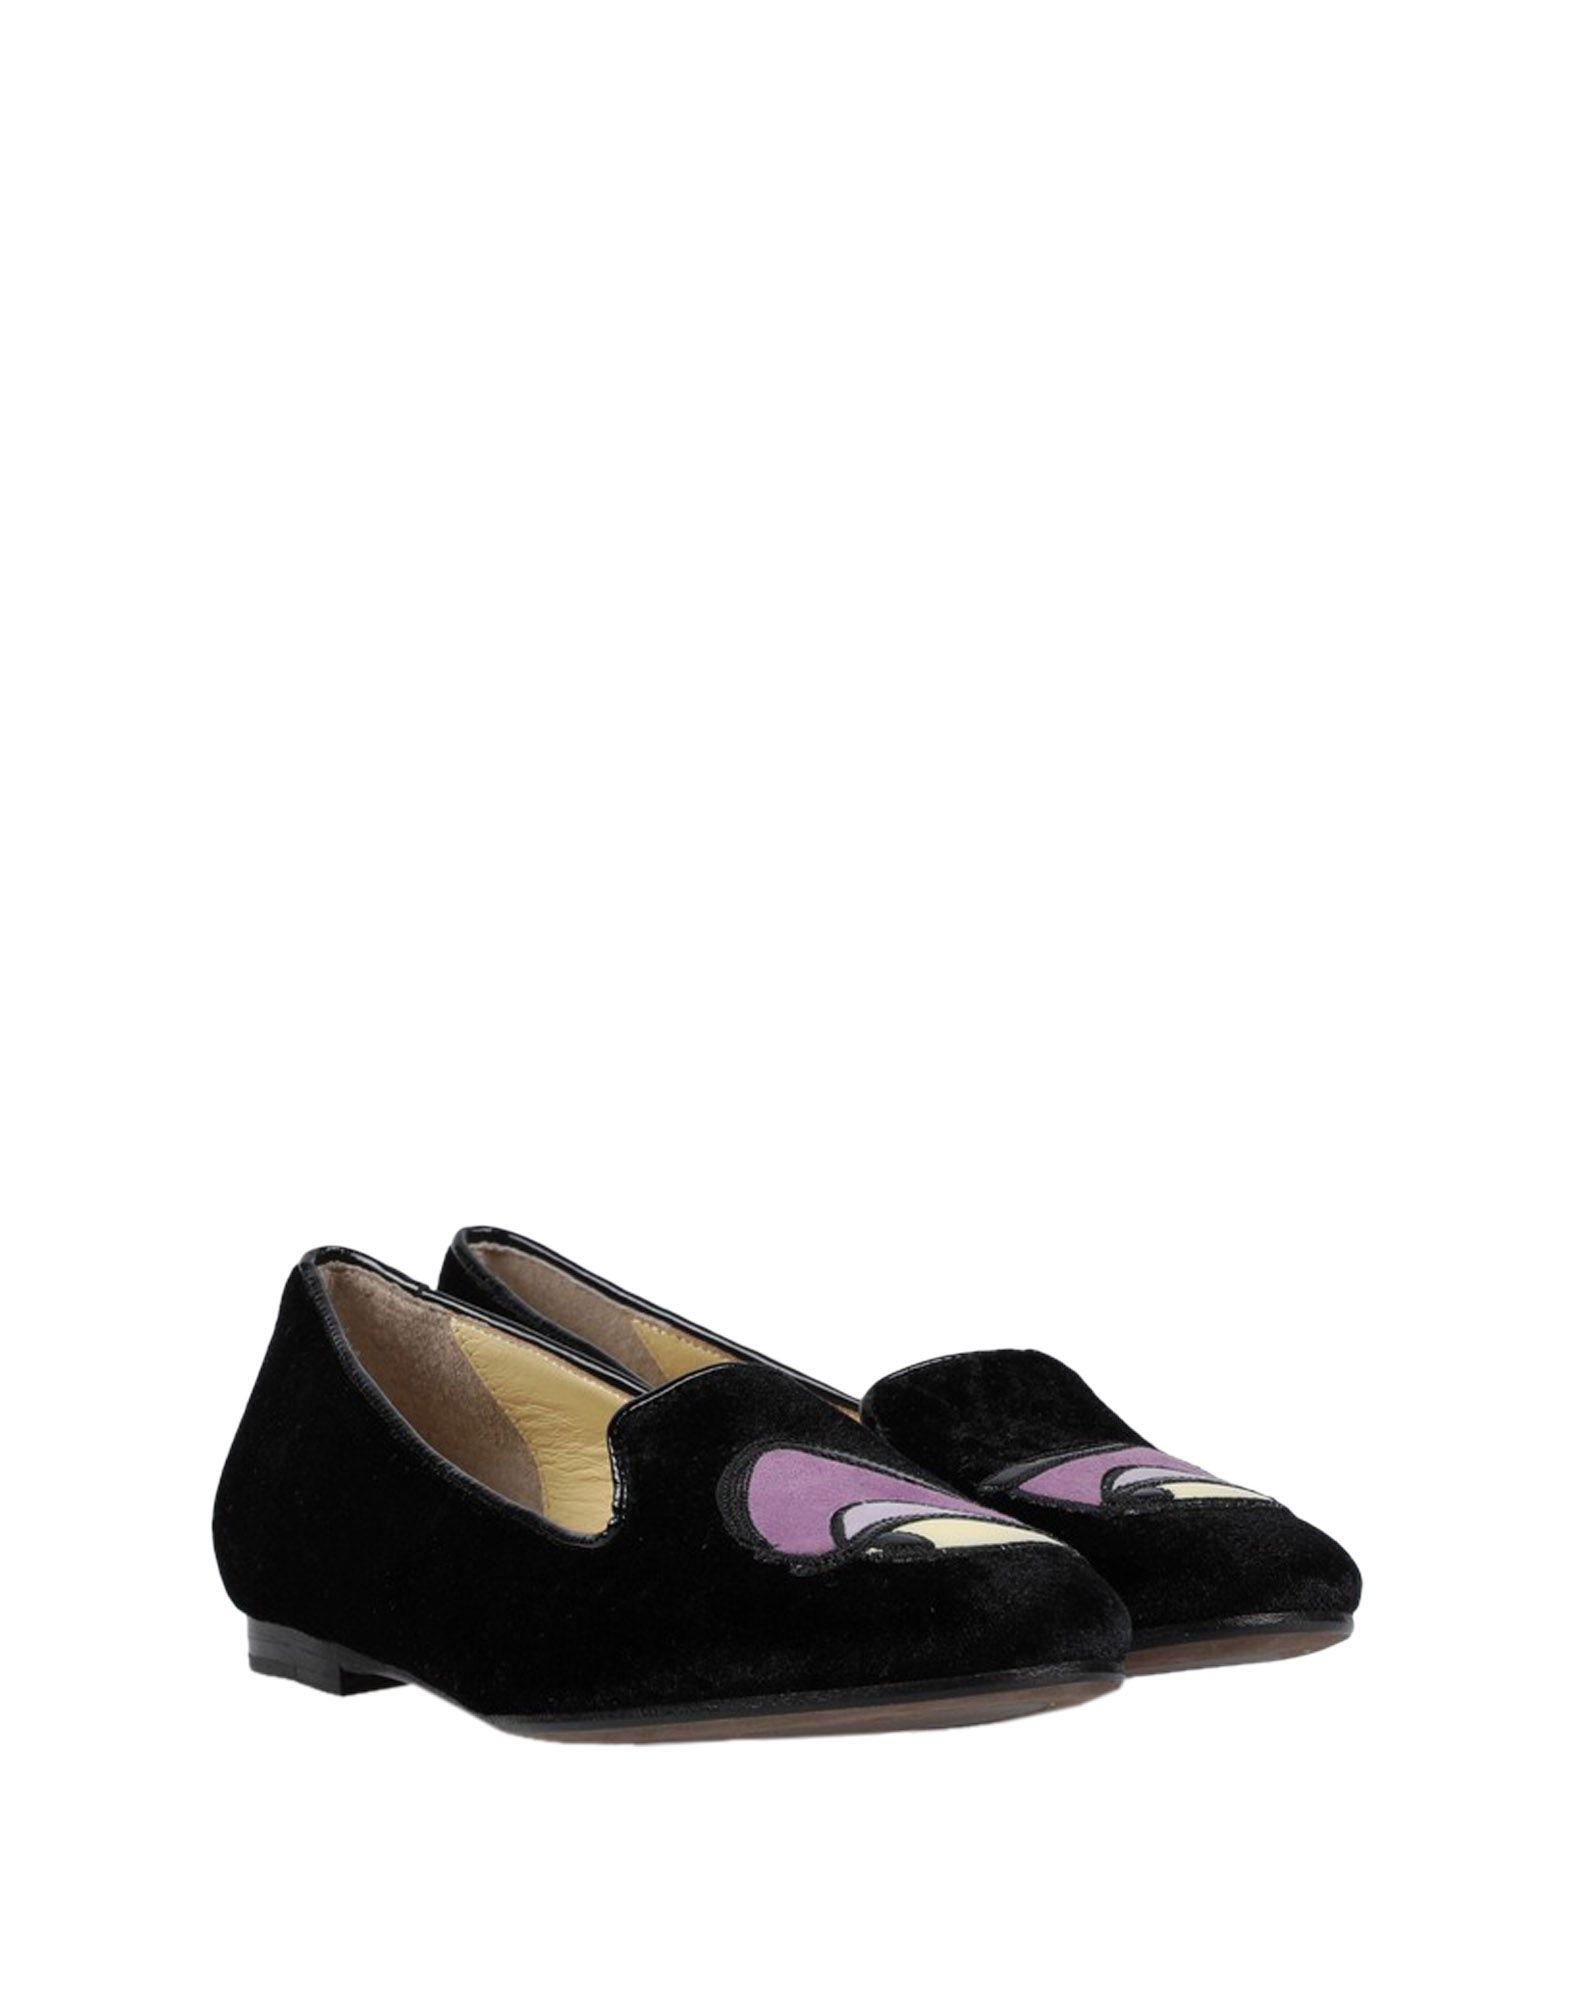 Chiara  Ferragni Mokassins Damen  Chiara 11546541AJGut aussehende strapazierfähige Schuhe 3ce9c6